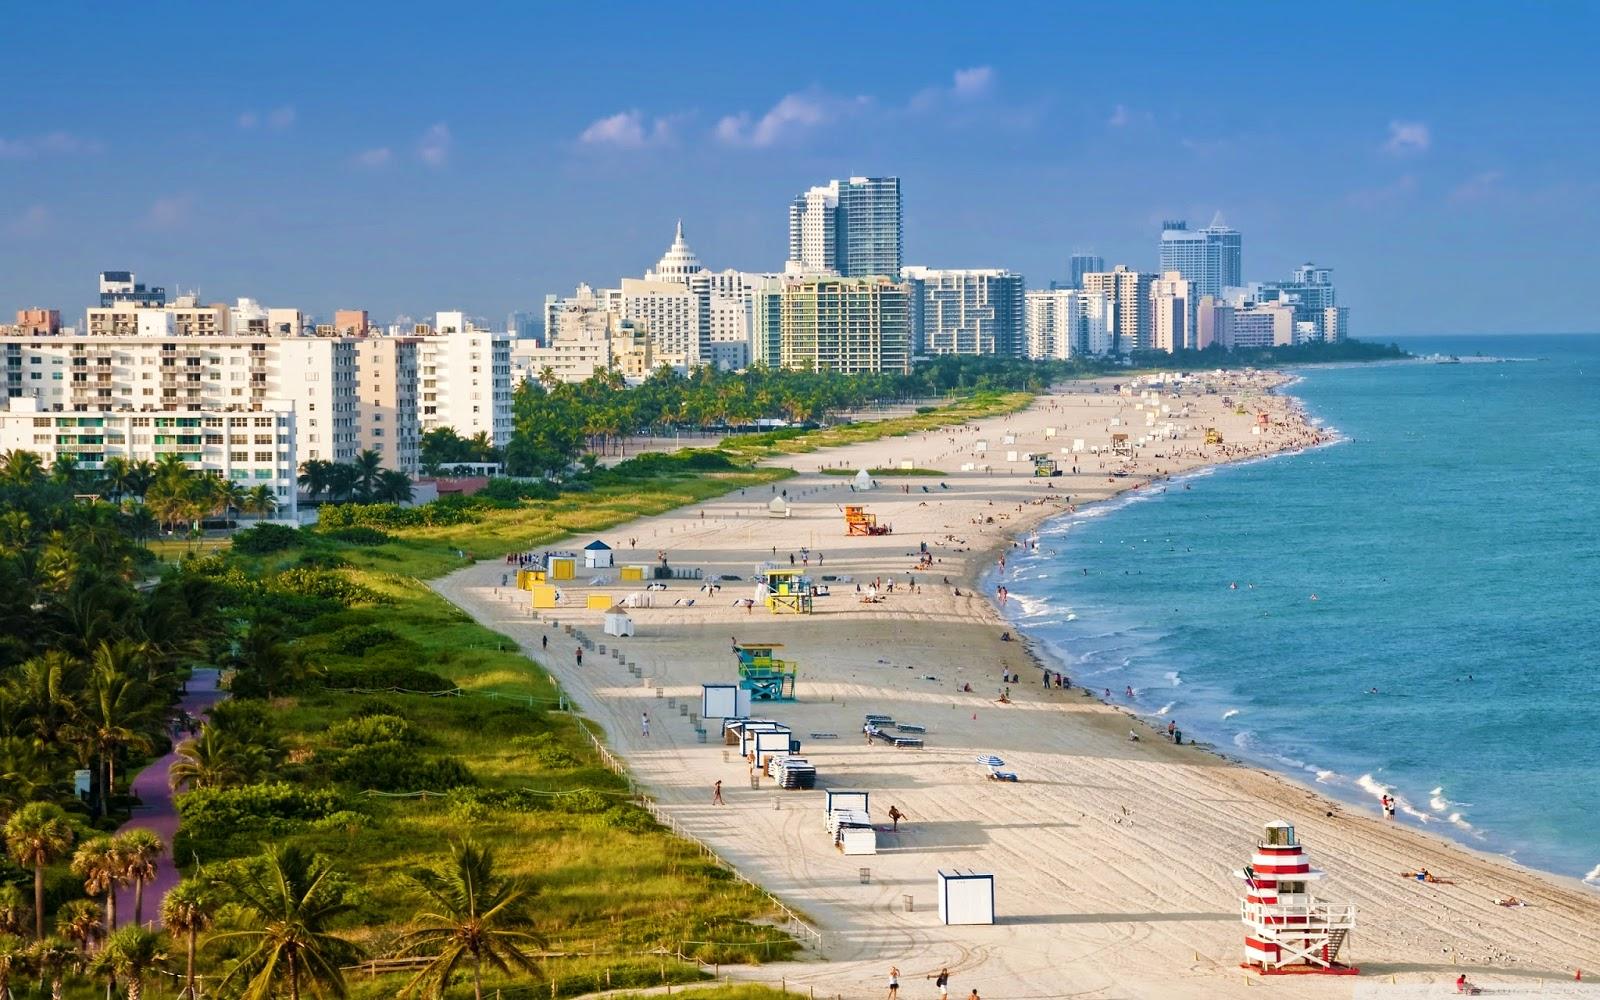 Papéis De Parede De Miami Beach